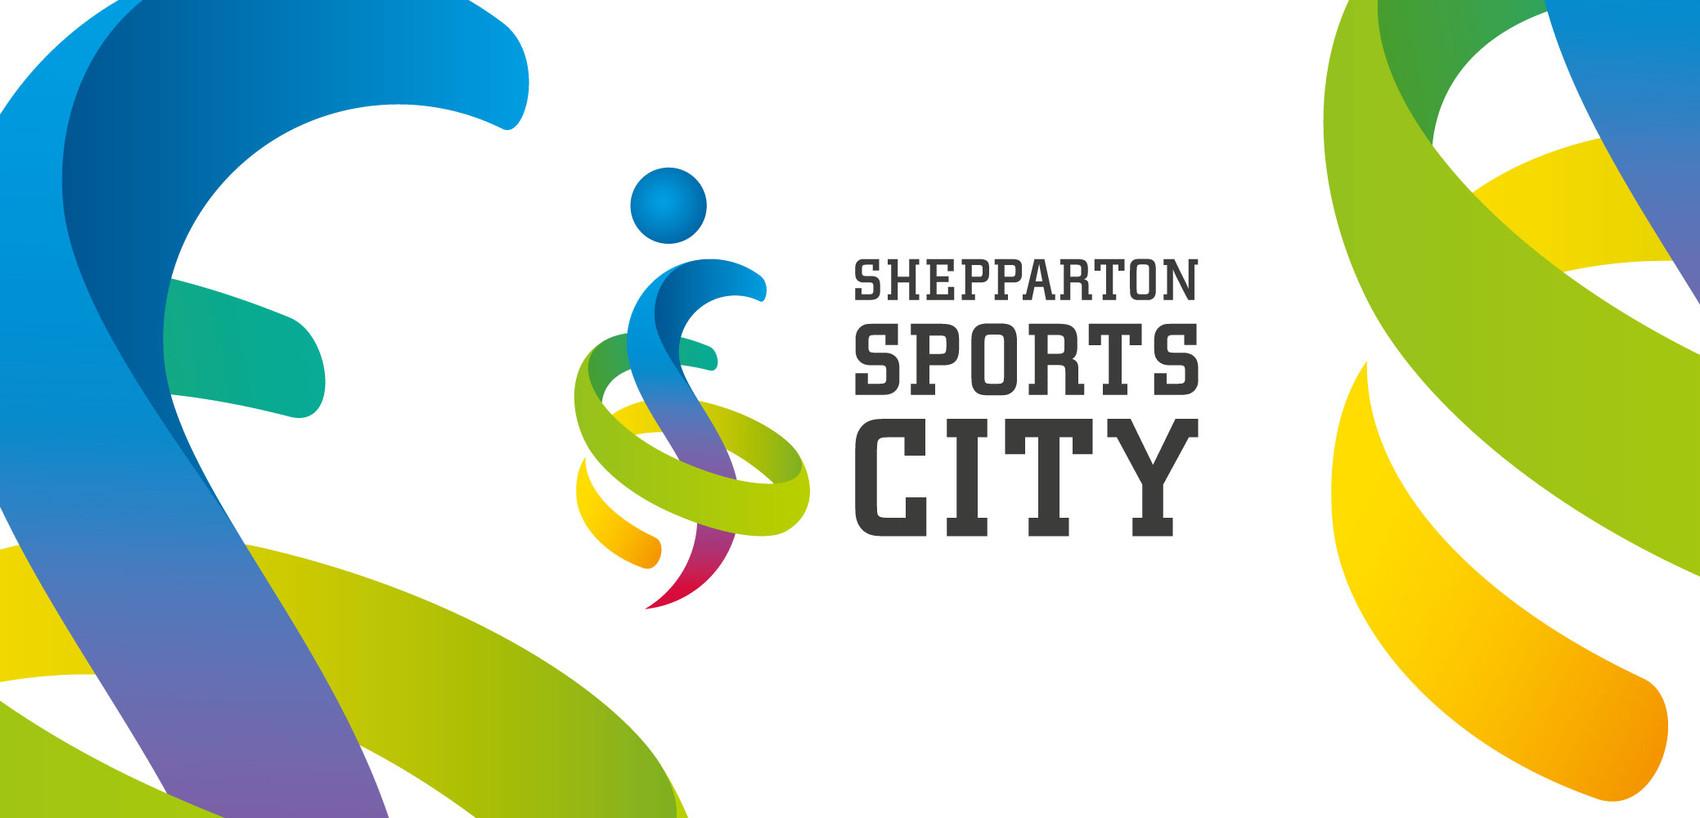 SportsCity_ID_4.jpg